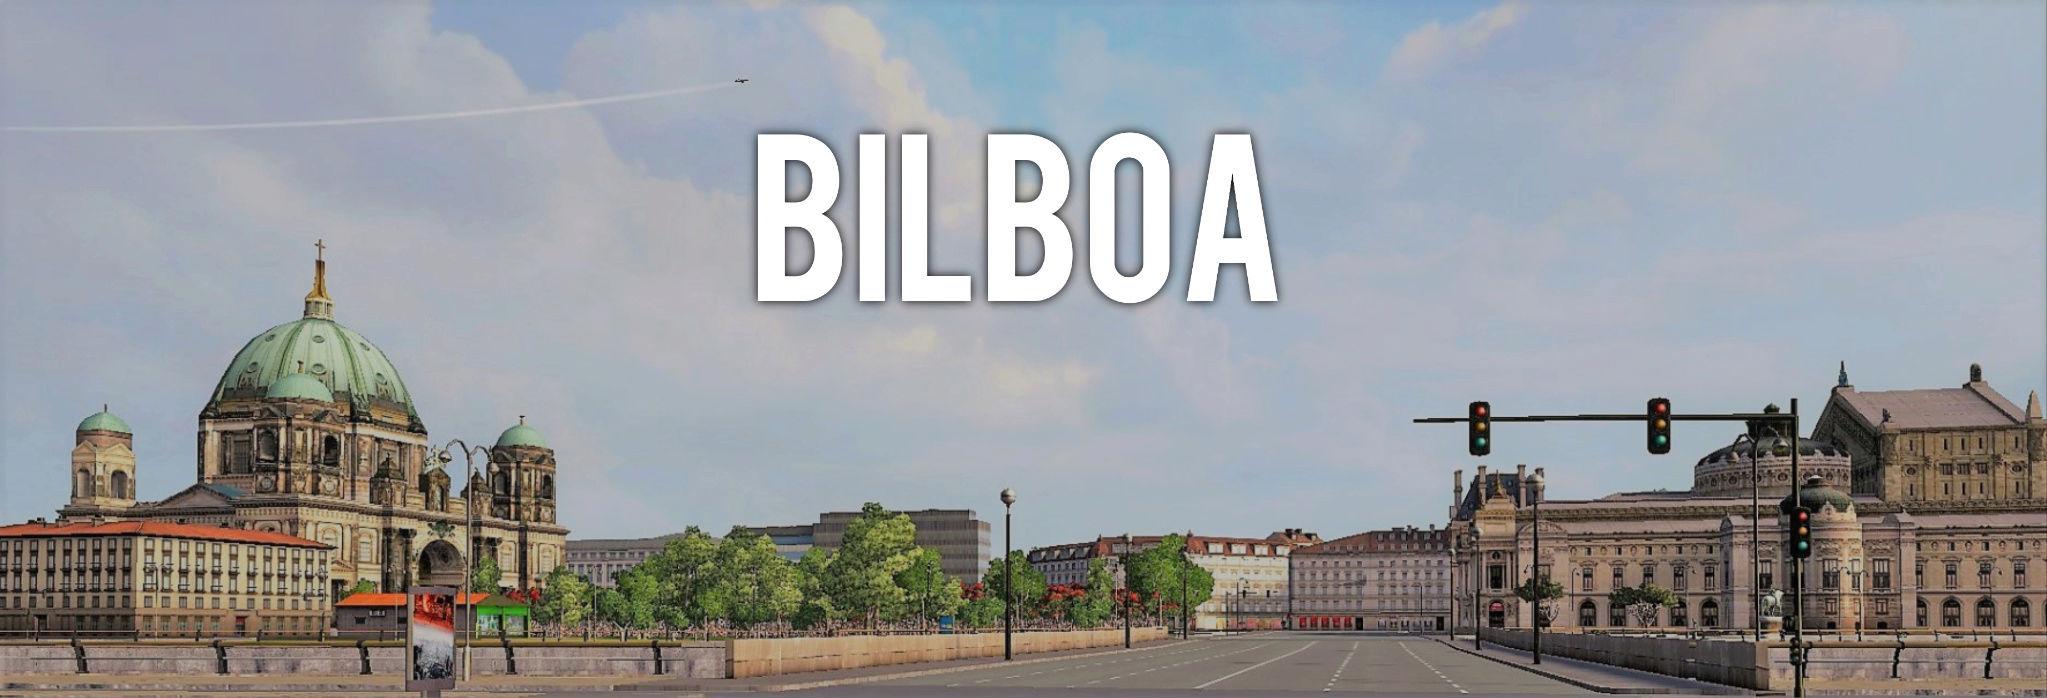 Bilboa Fontca11